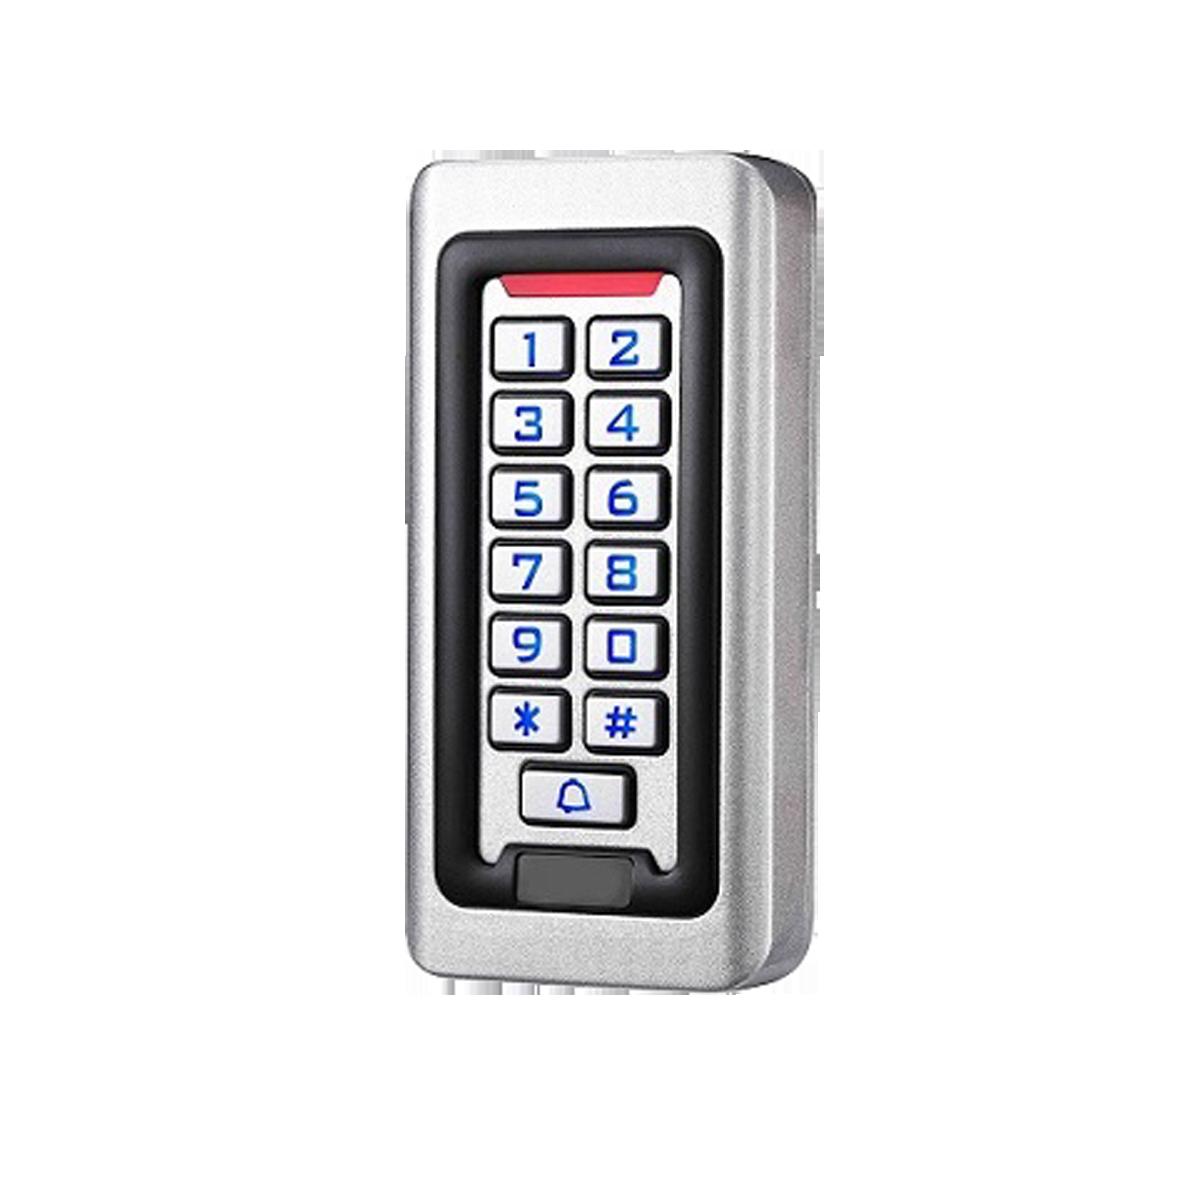 Teclado IP66 Leitor Cartões GS ACCESS